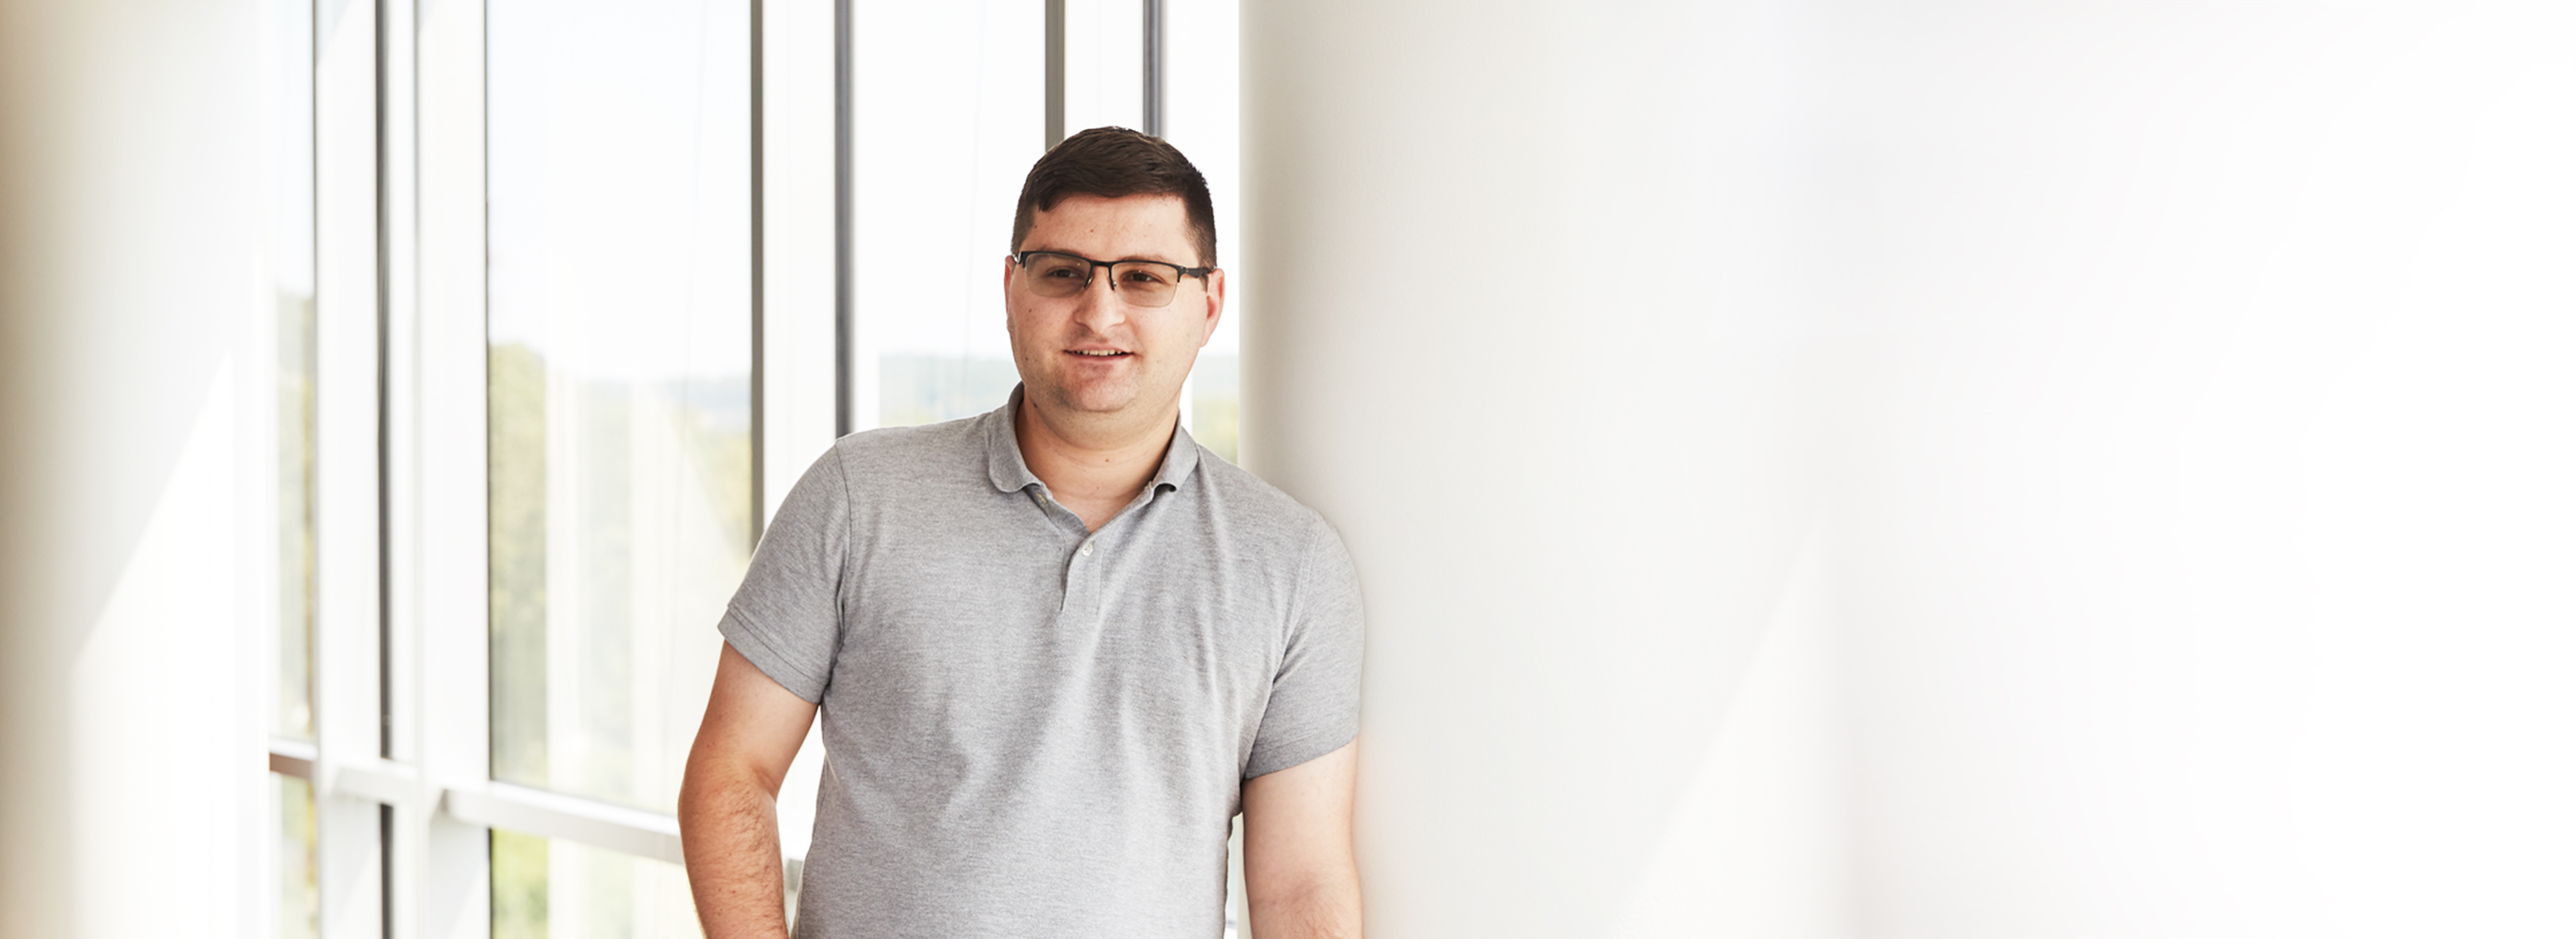 Jason application developer/software engineer